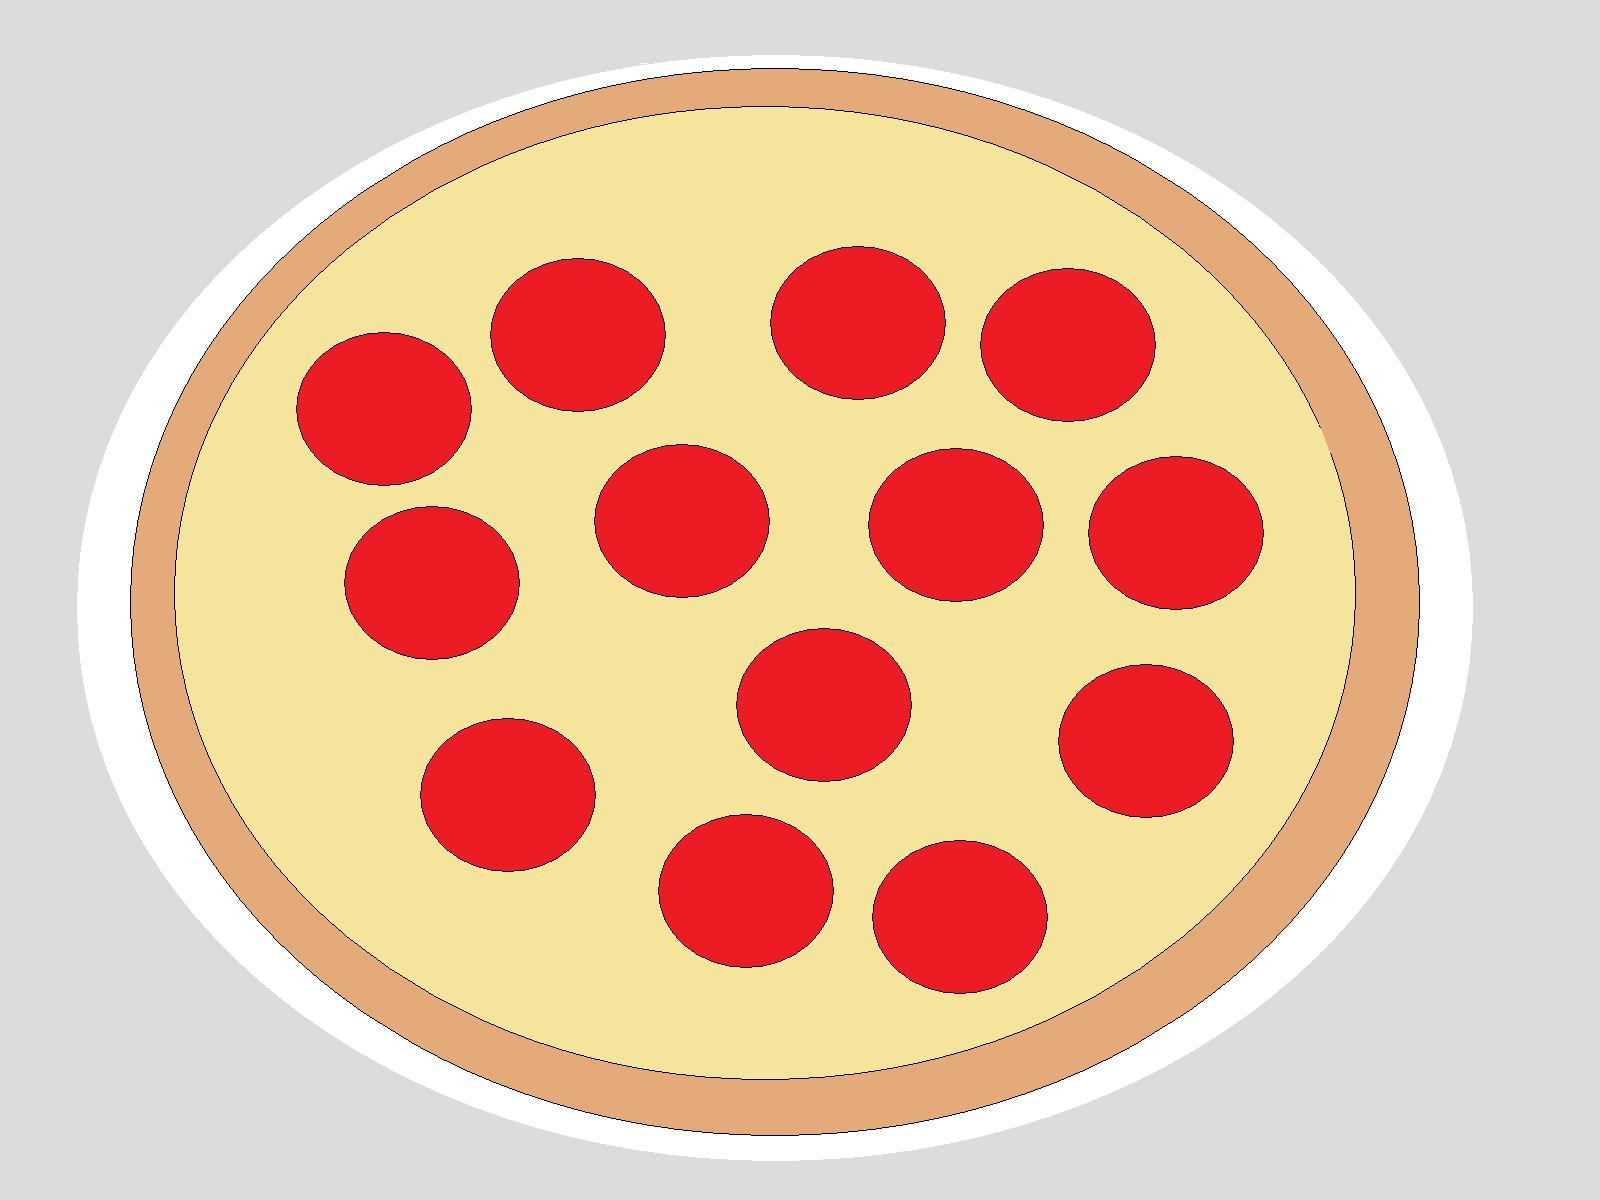 Pizza clipart cartoon Food Hd Pizza Art n